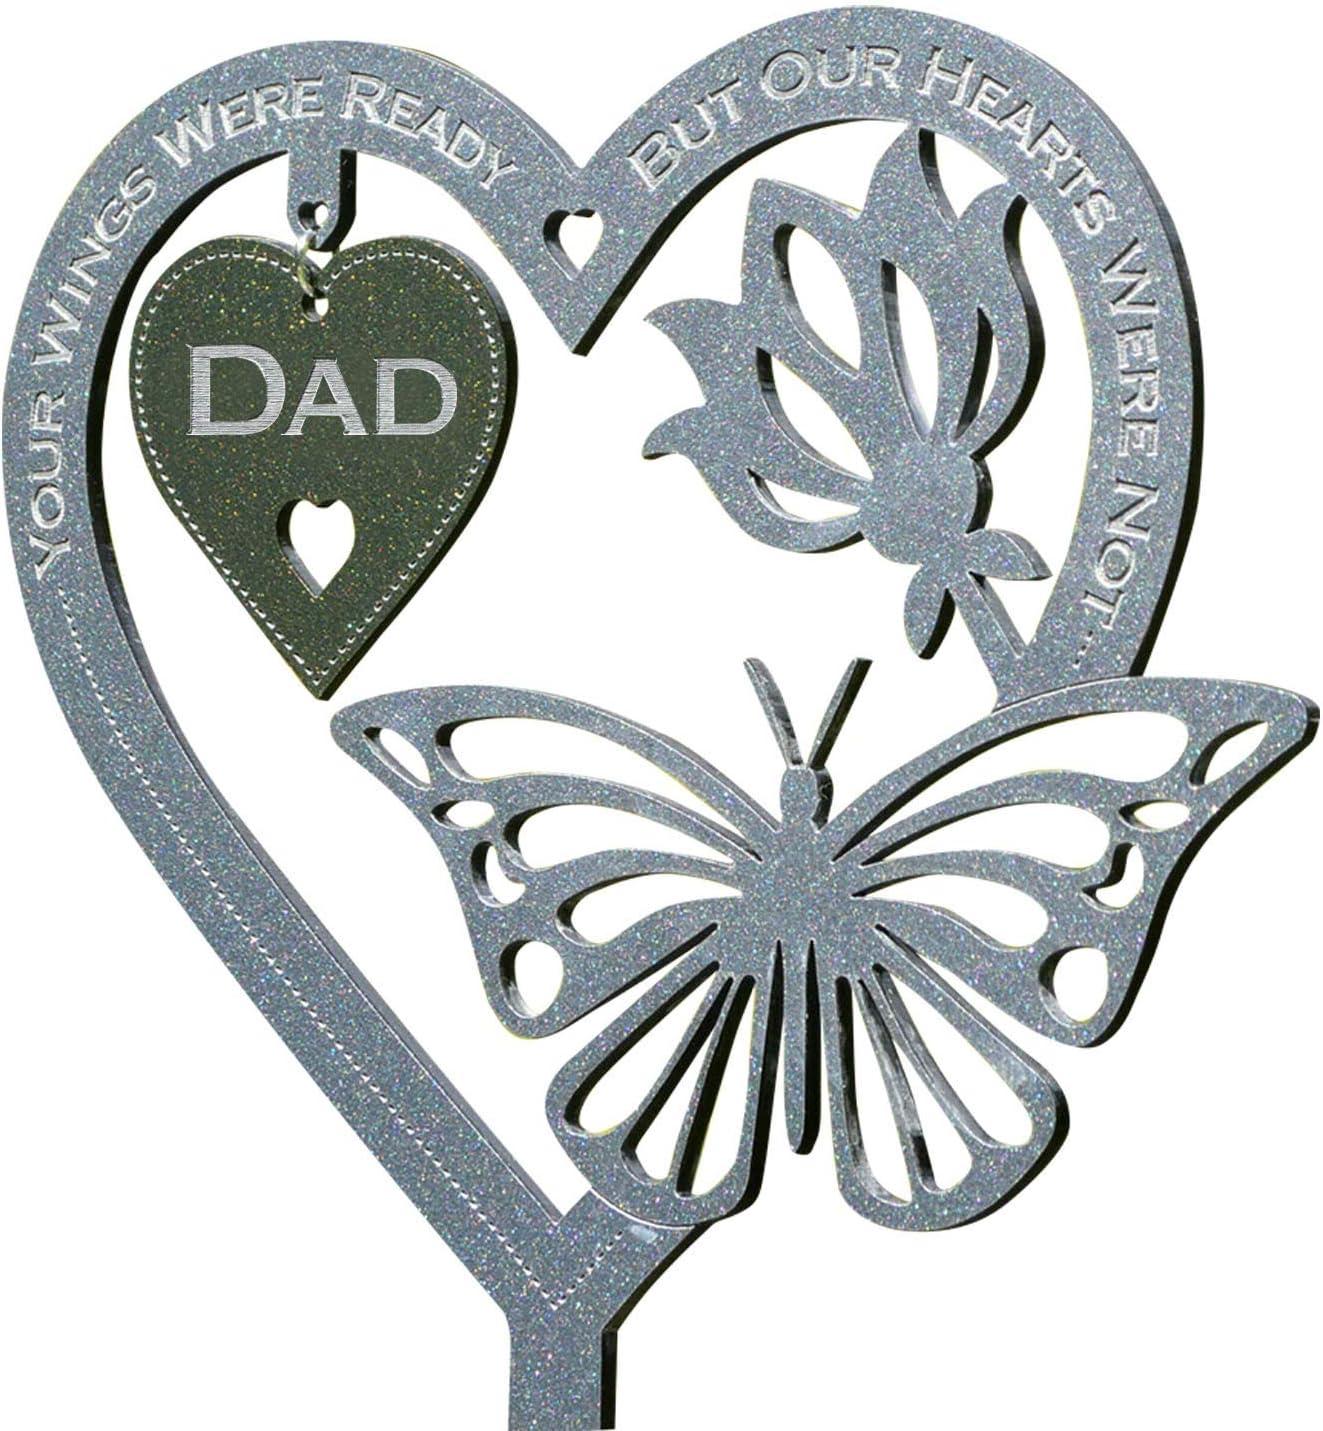 Flower Heart Butterfly Oranement Hanging Plaque with Dad/Husband/Mom Letter, Garden Memorial Keepsake Decoration for Lawn Garden Yard Indoor Outdoor Decor, Birthday Gift for Women Men (Dad)